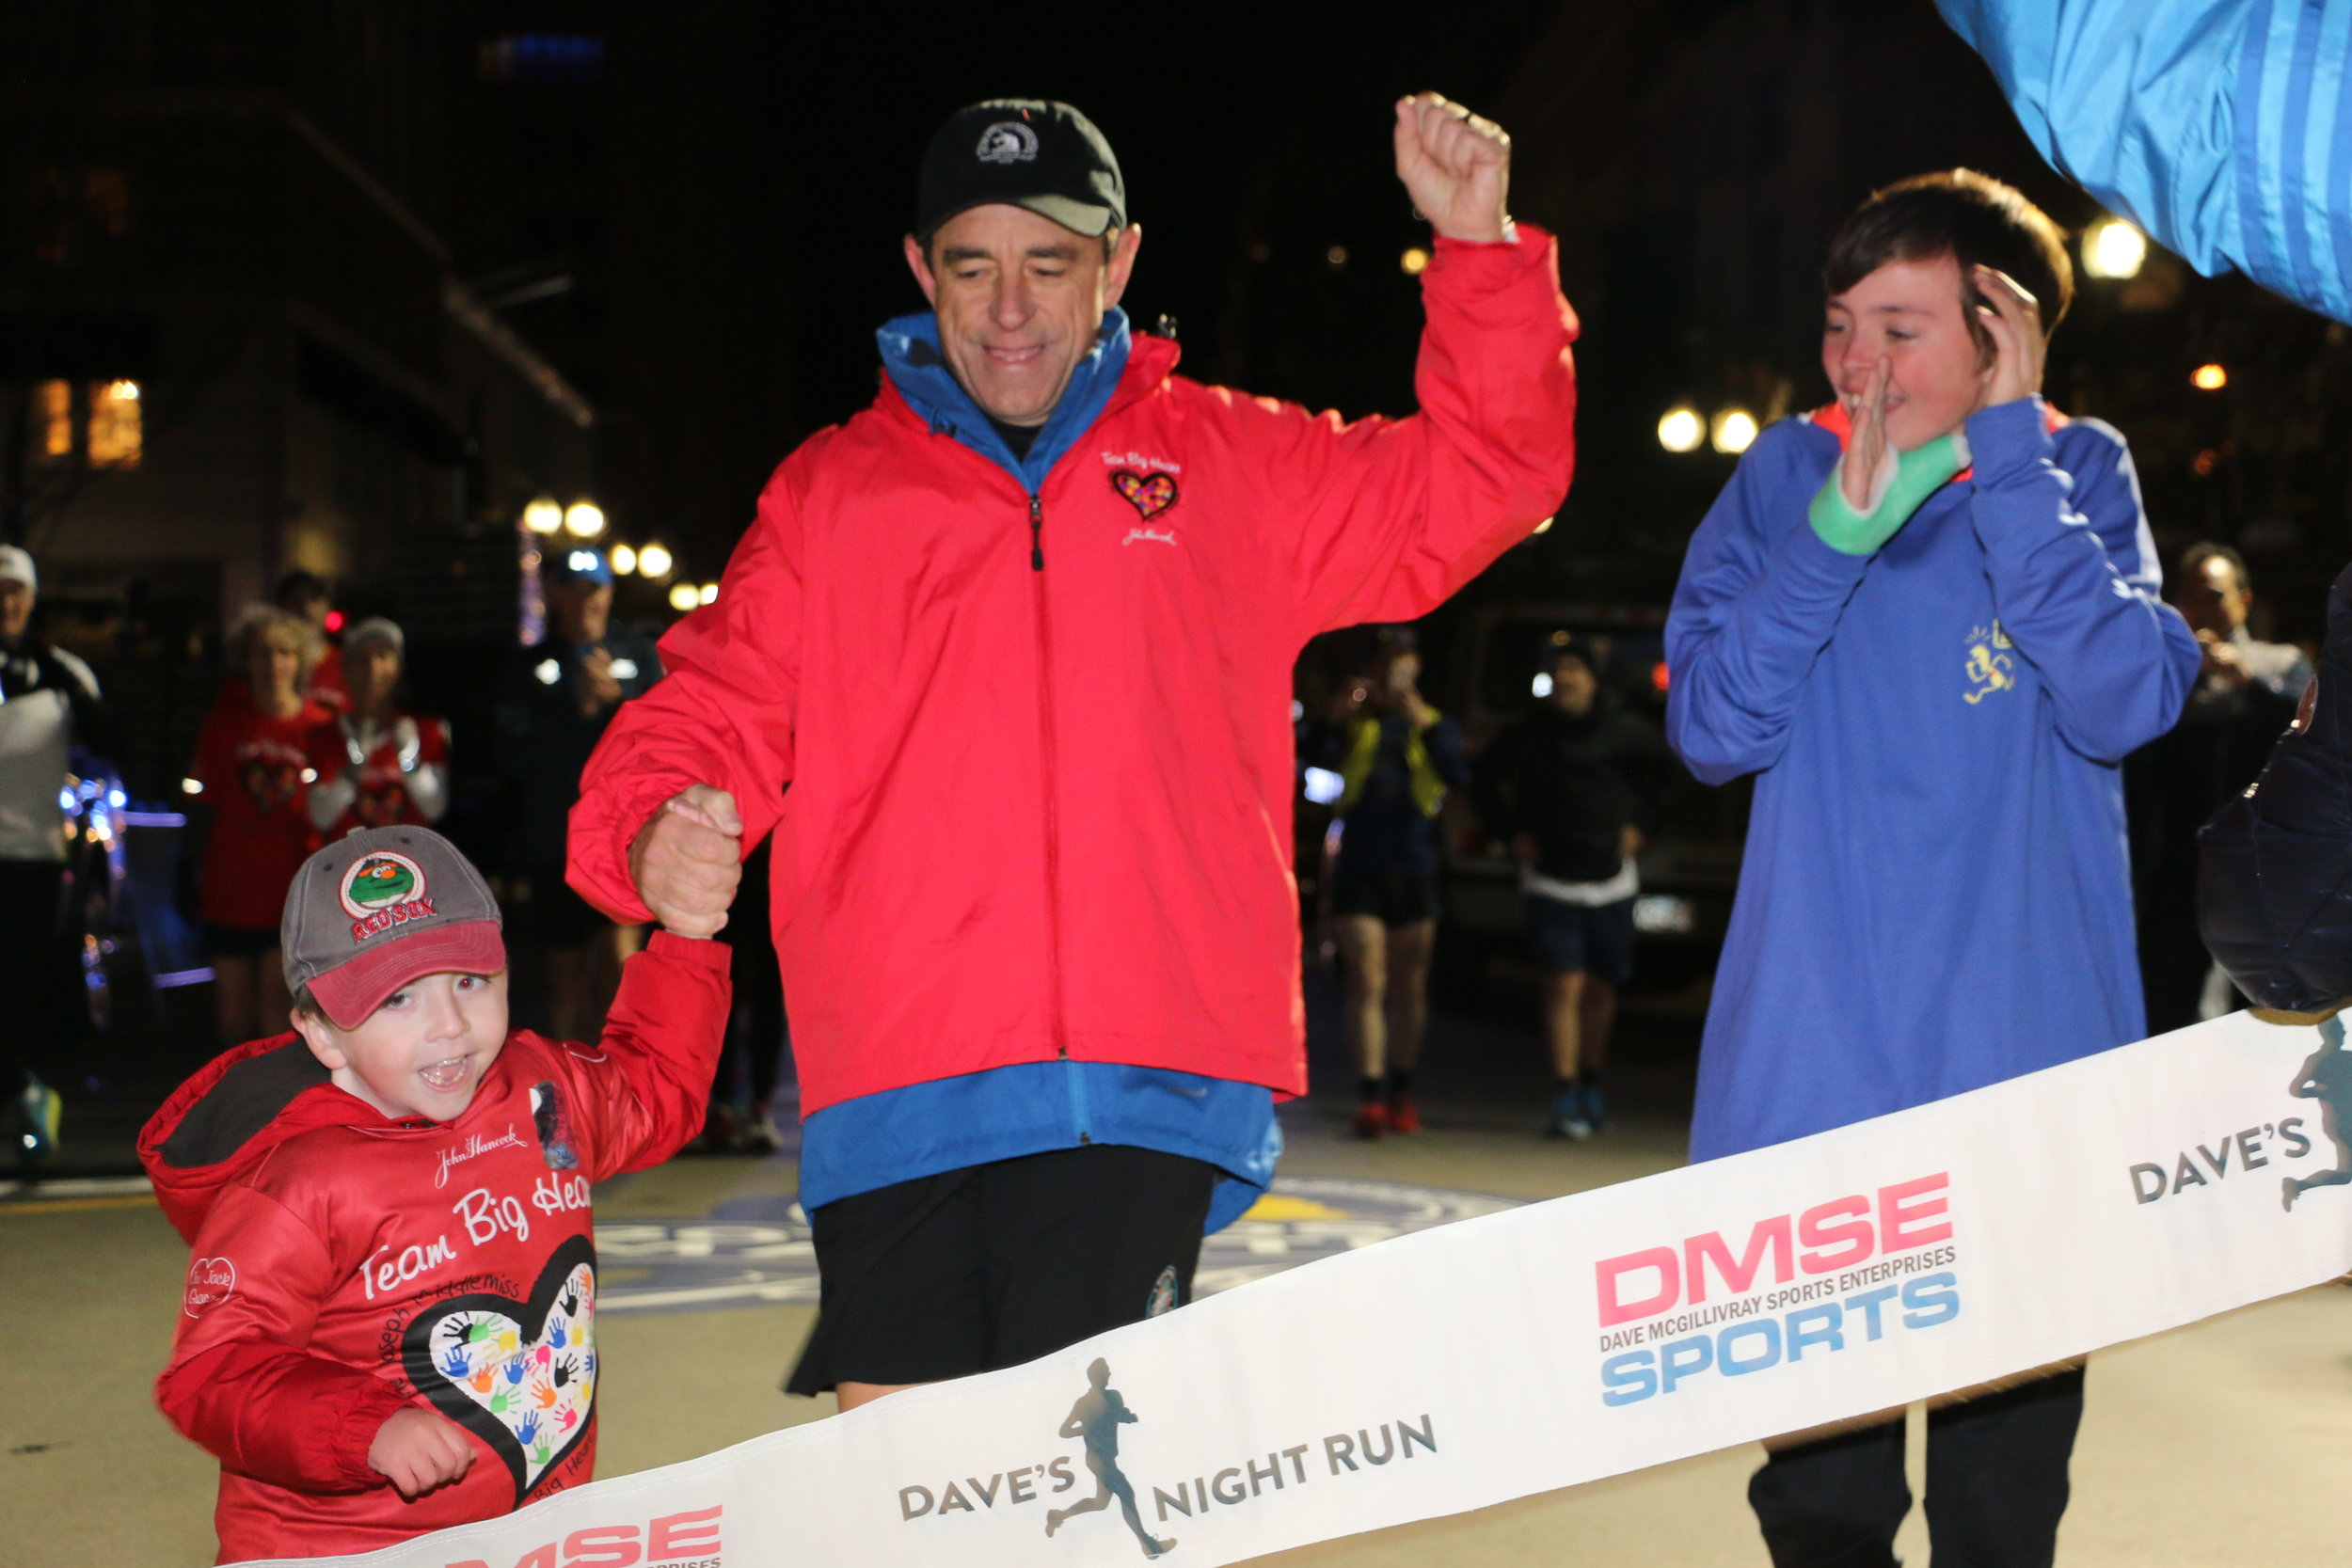 Dave McGillivray crosses the finish line of the Boston Marathon holding hands with Jack Middlemiss, while McGillivray's son, Luke, cheers.   Bob McGillivray